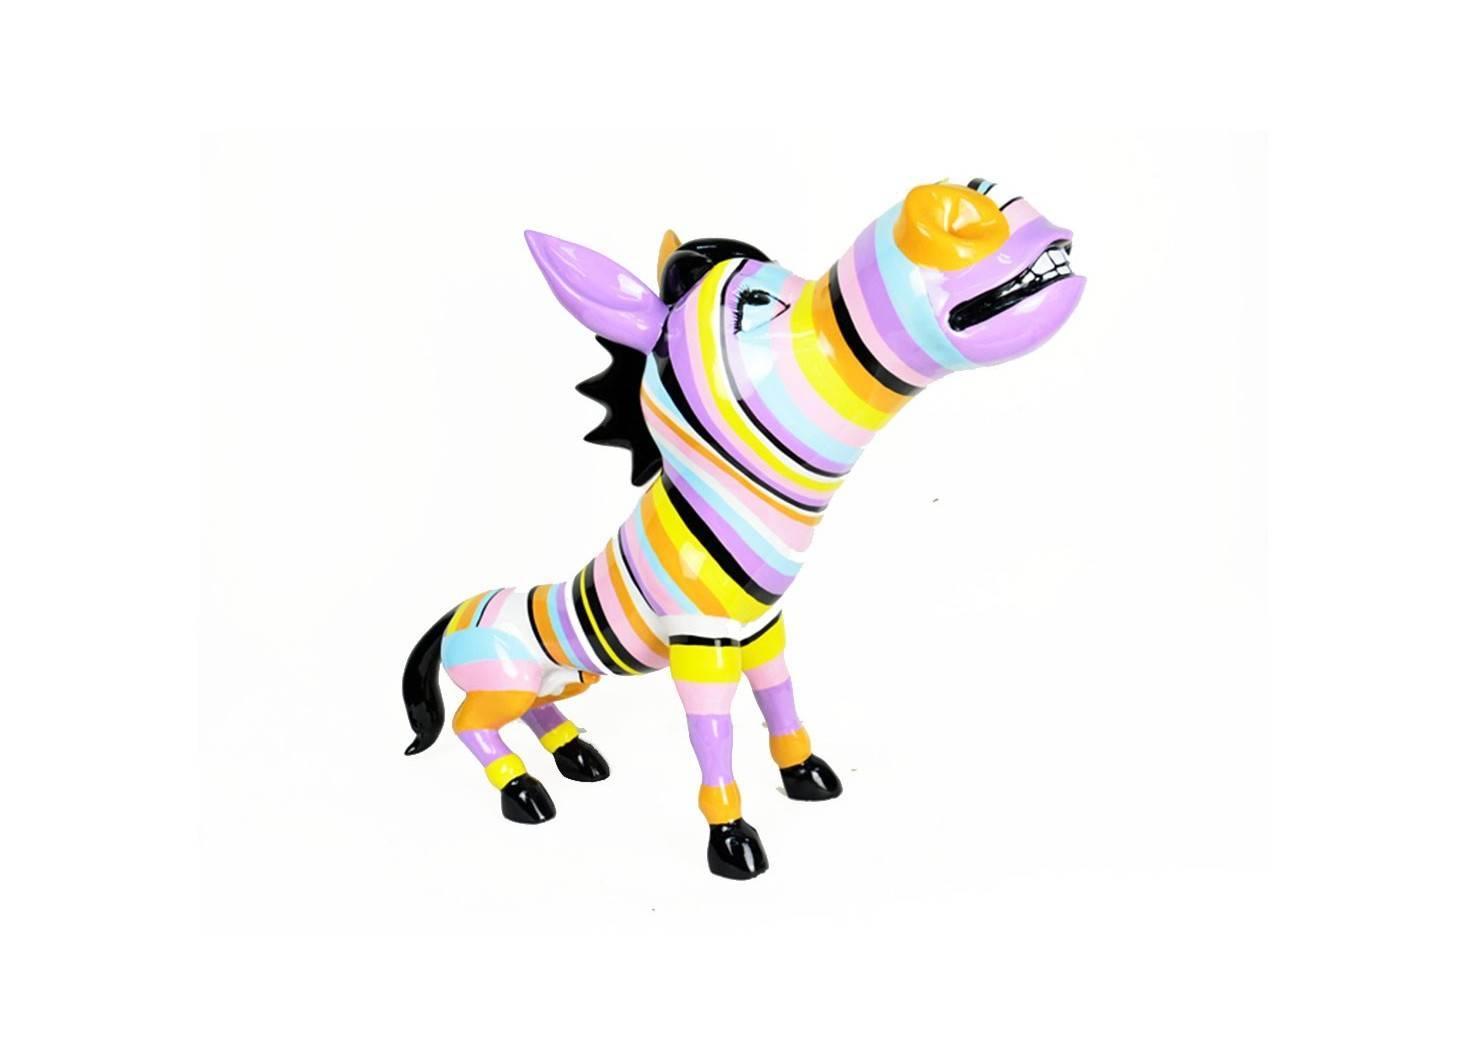 Colourful donkey statue